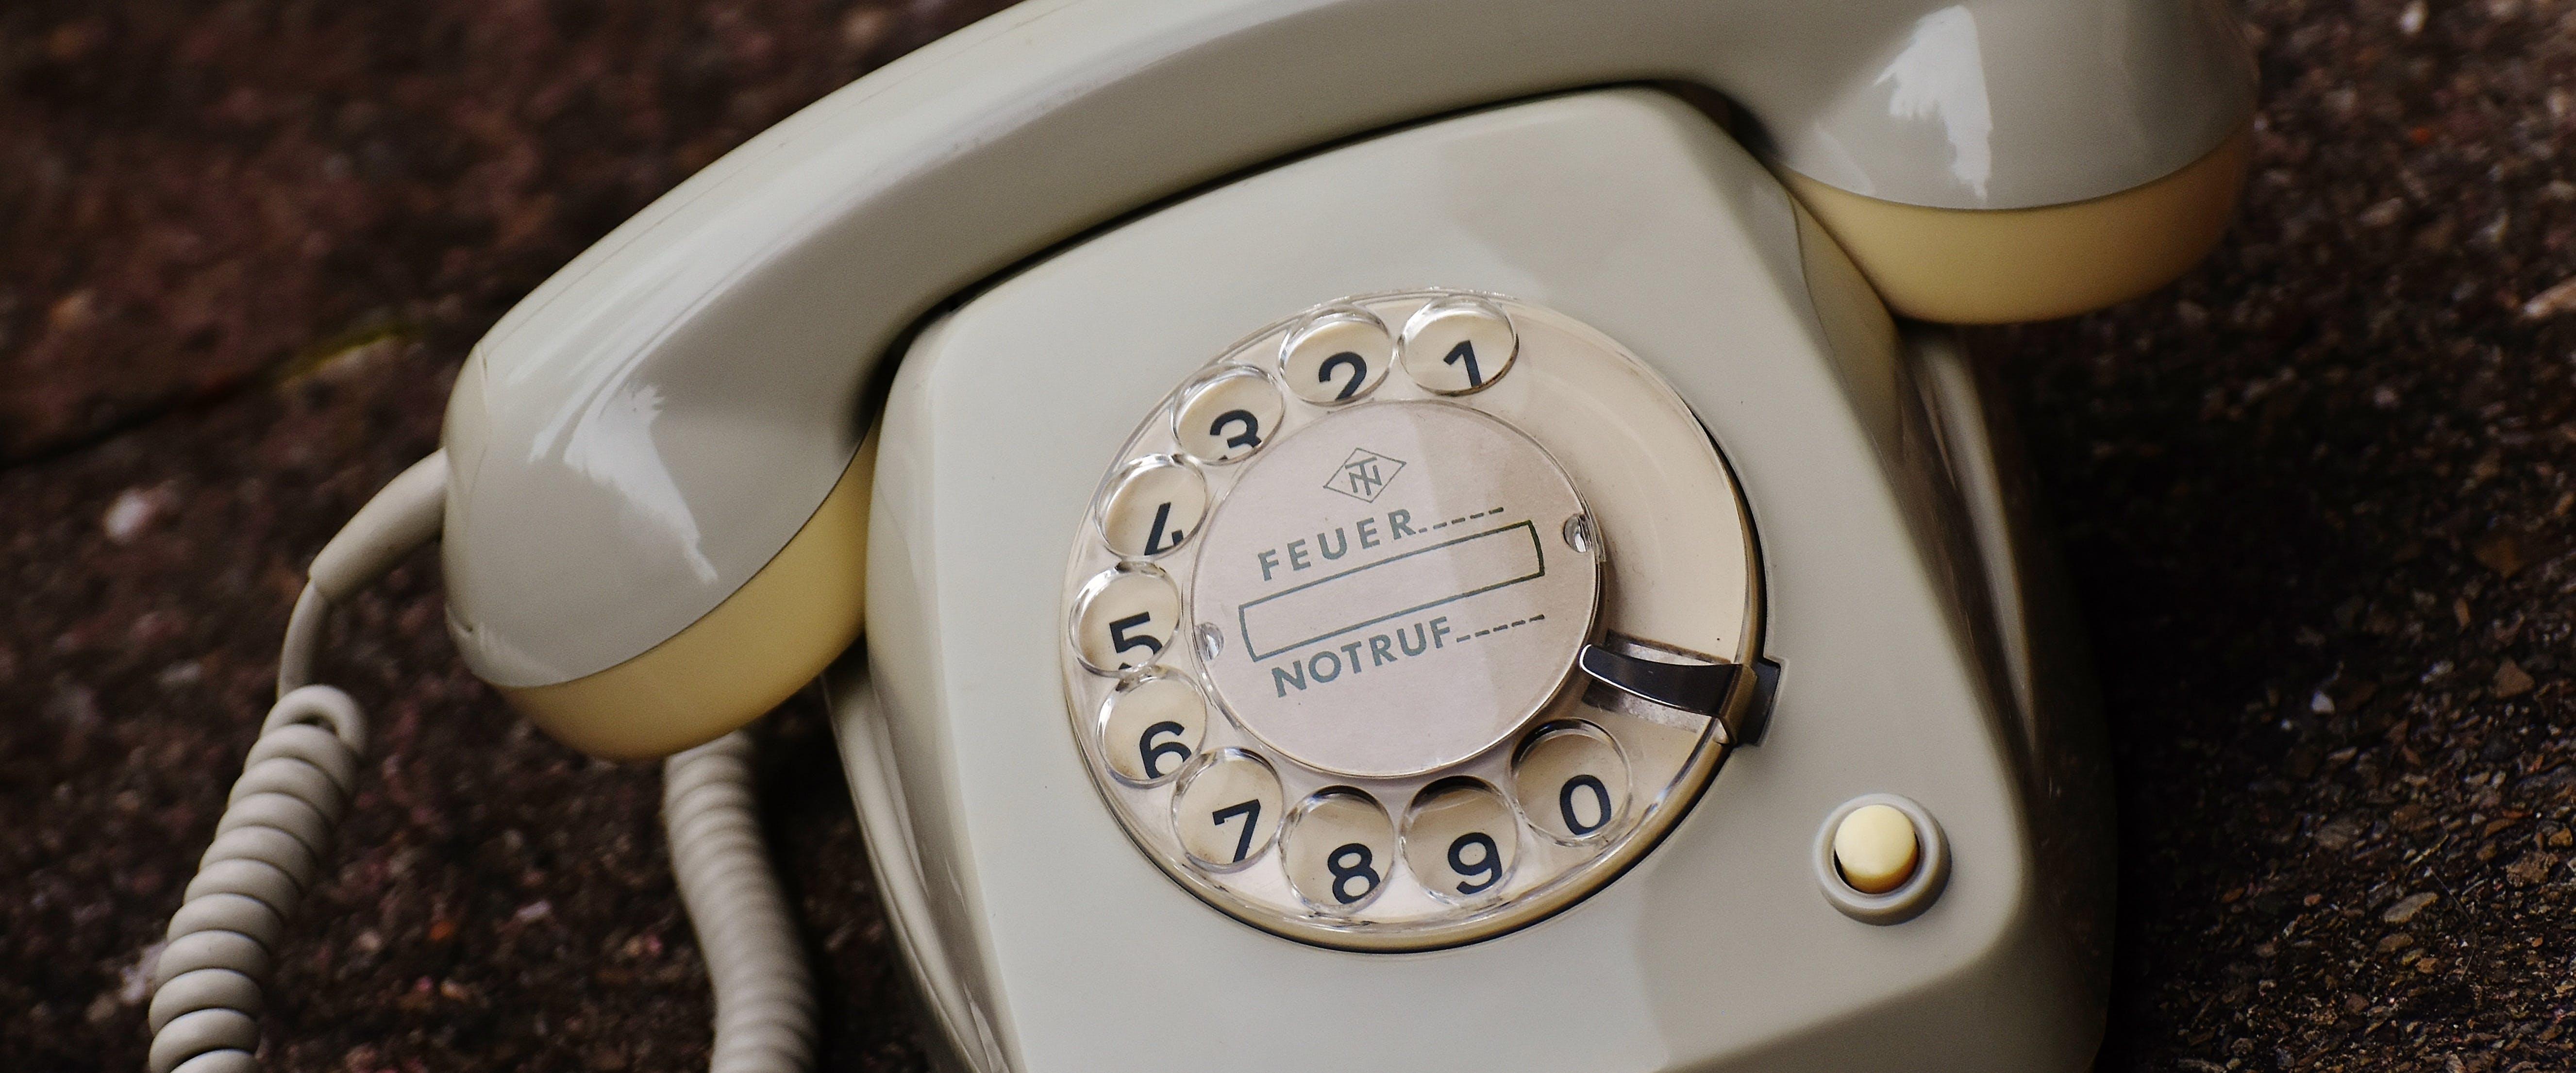 classic, close-up, dial